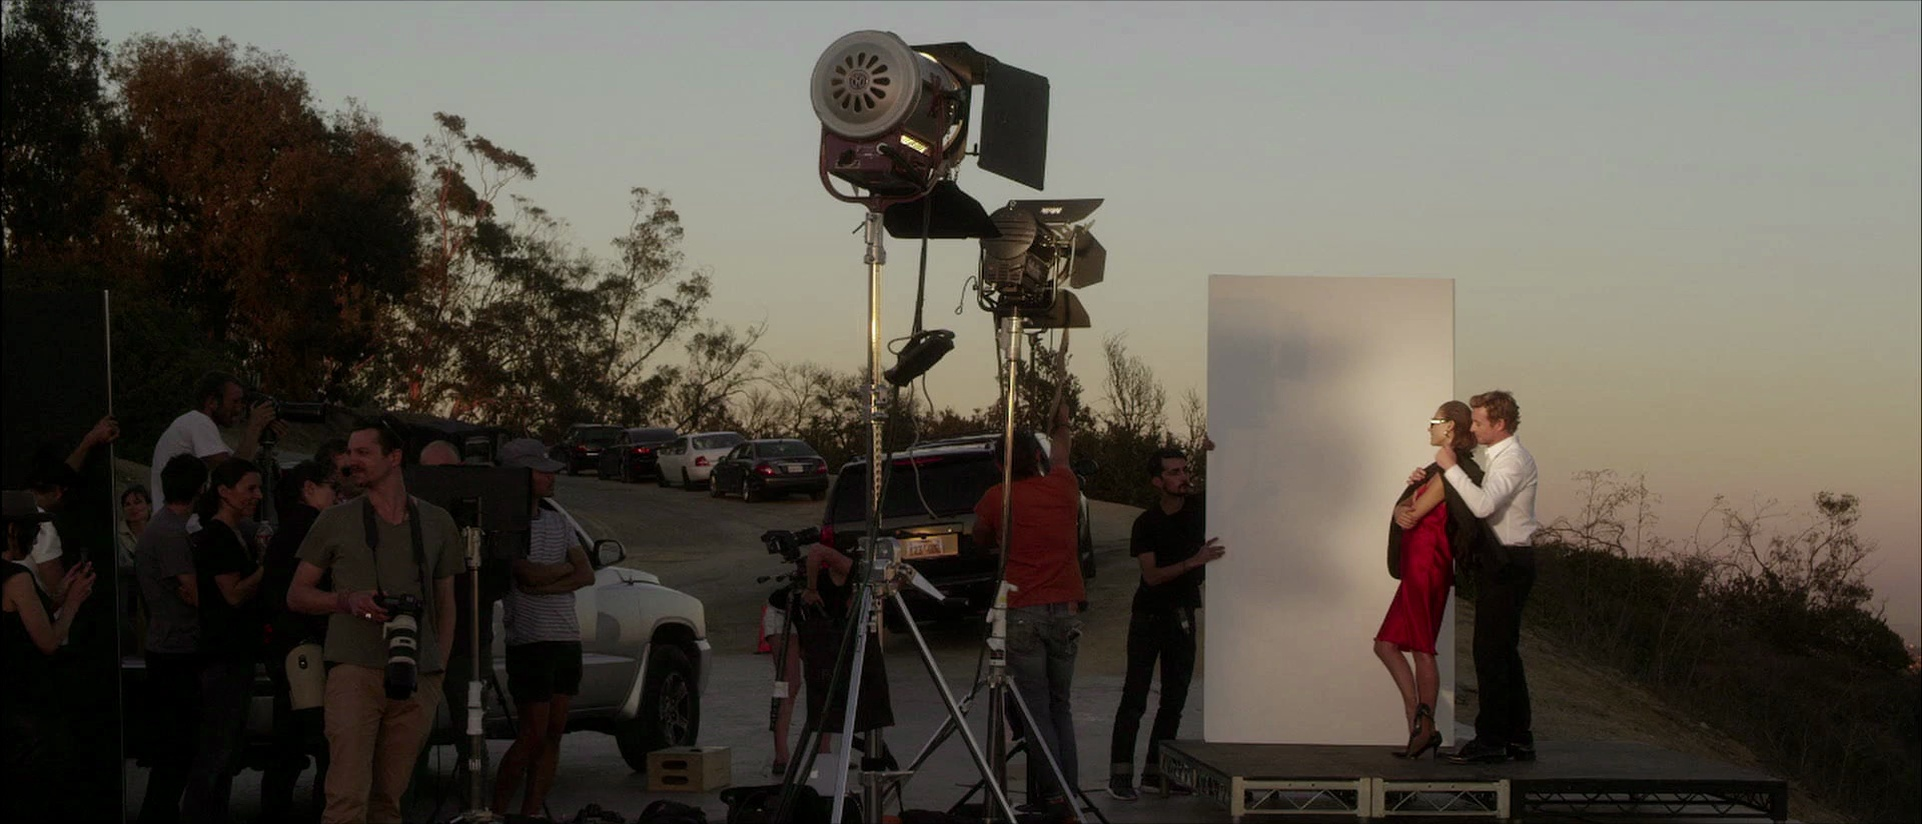 Le making of du shooting Gentlemen Only Intense de Givenchy